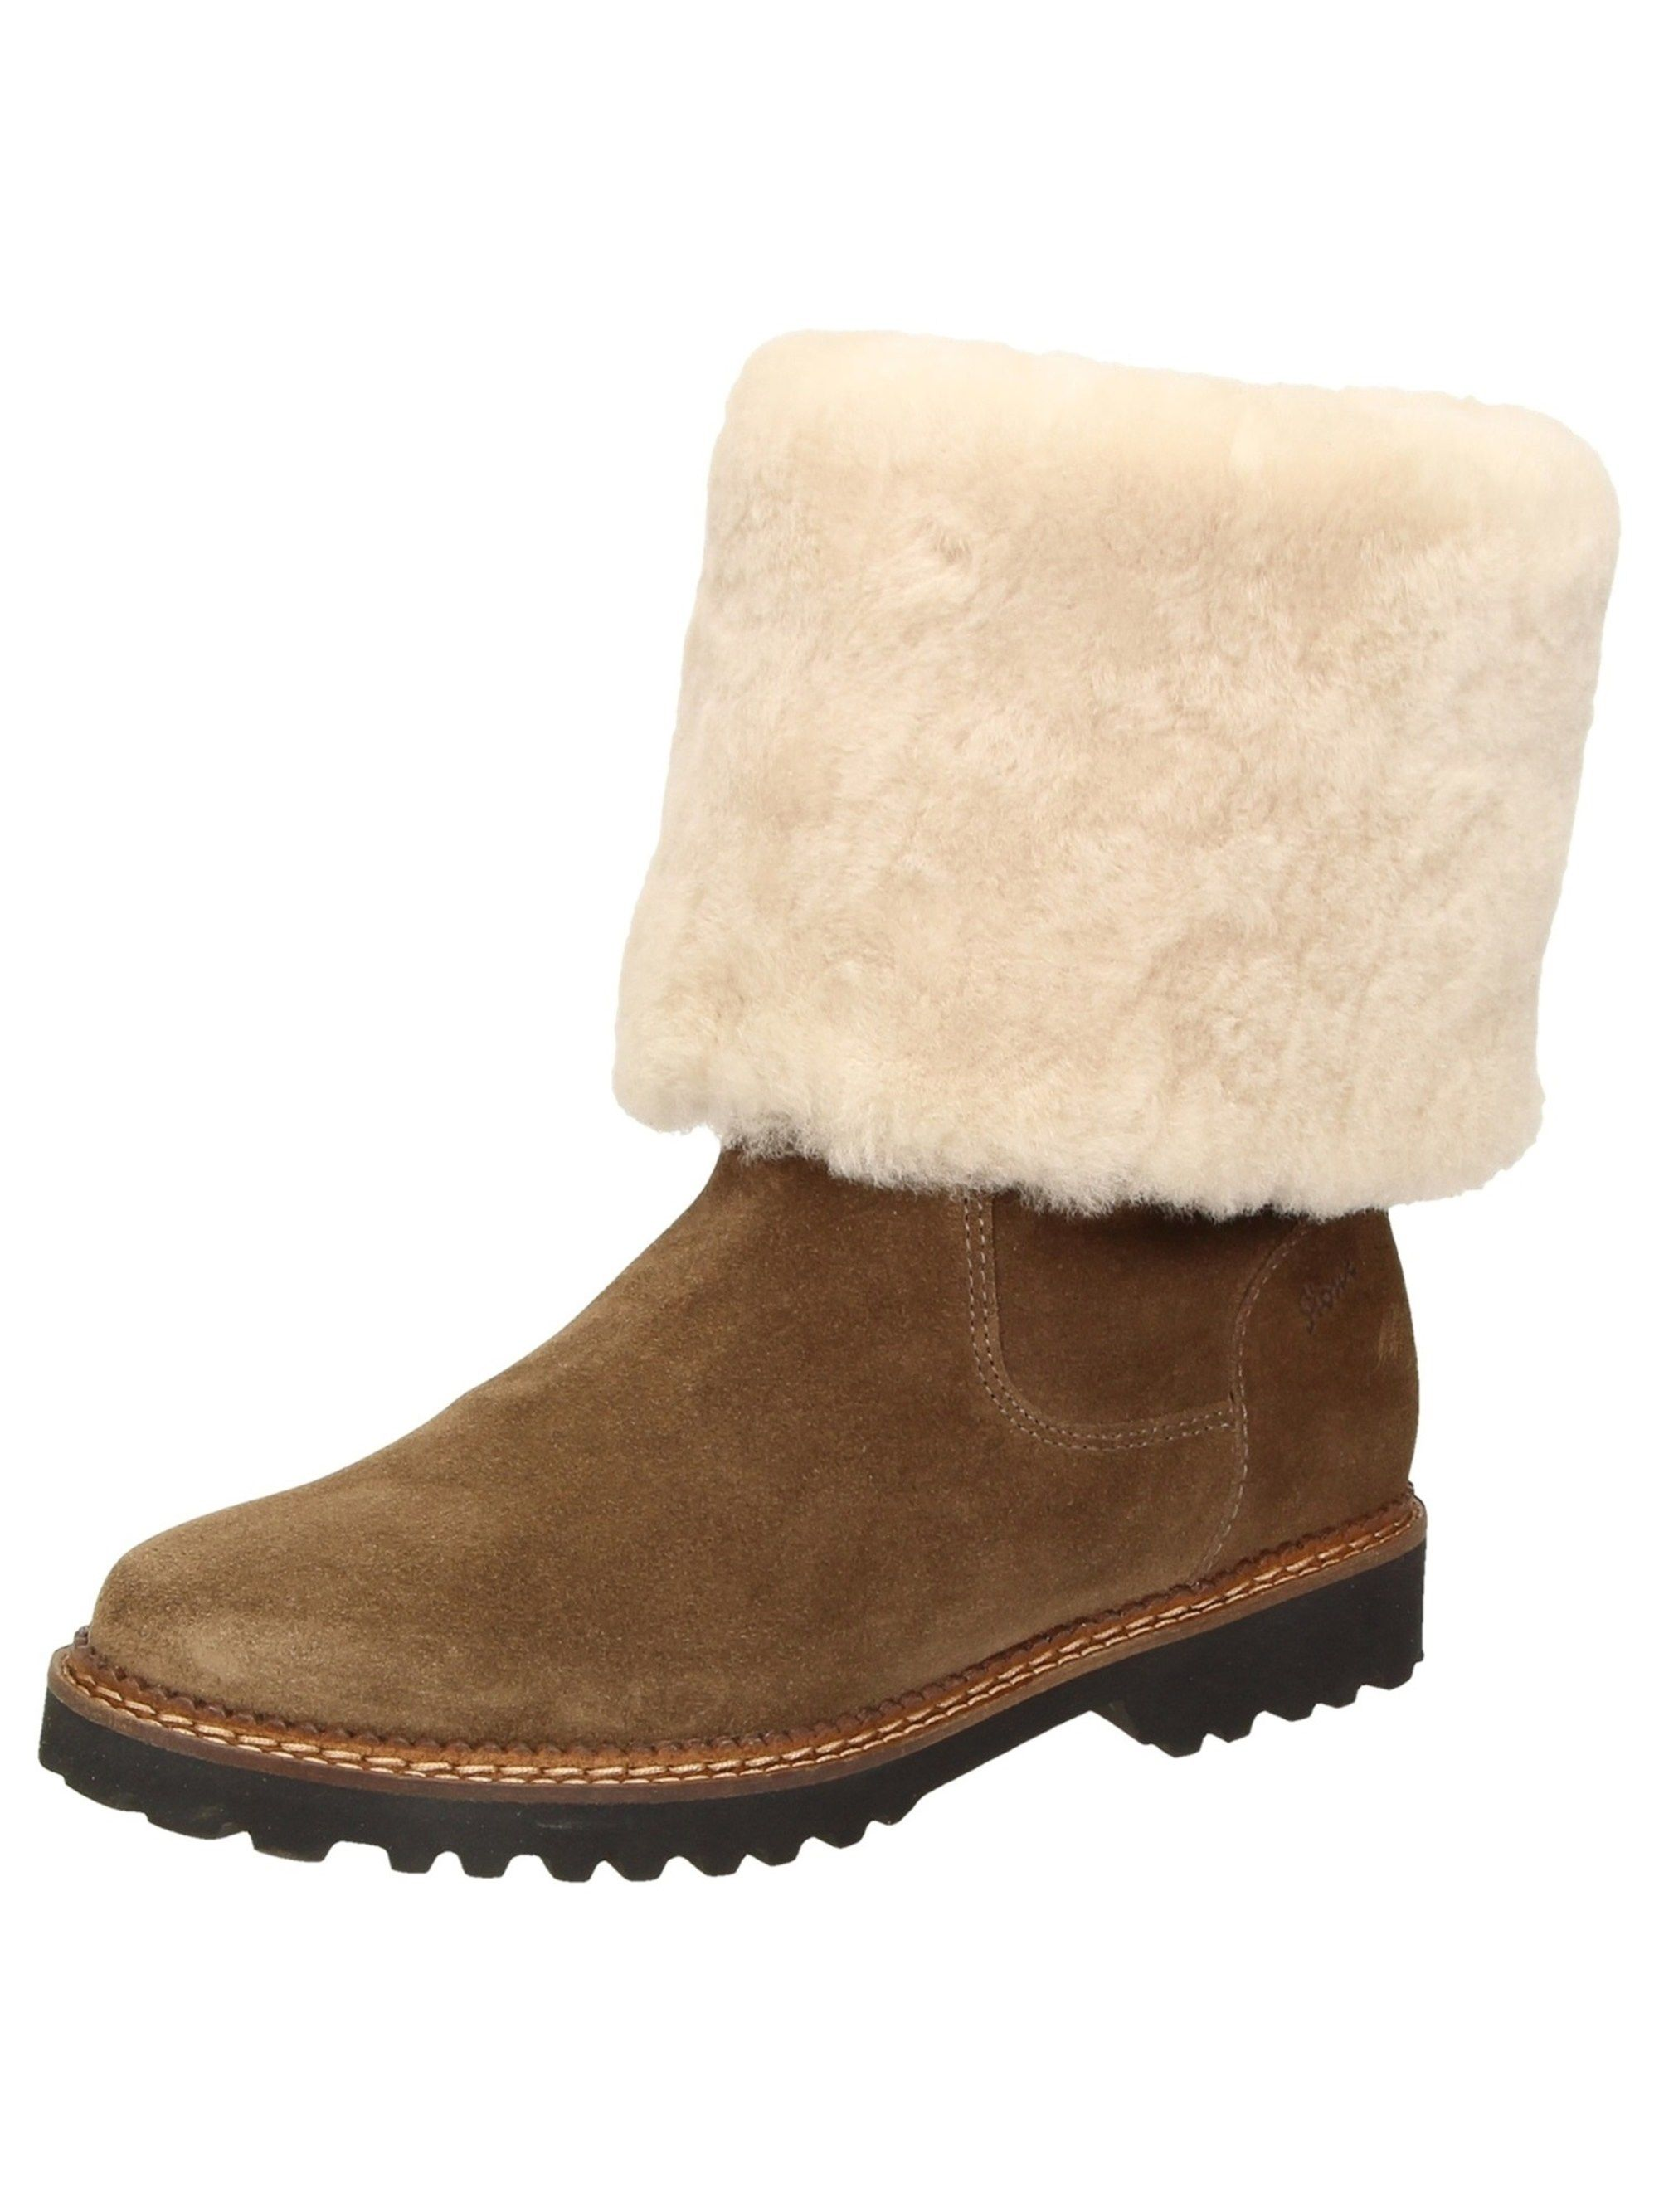 Damen SIOUX Stiefel Velma-LF beige braun braun   Material  Leder  Material  90157910fd